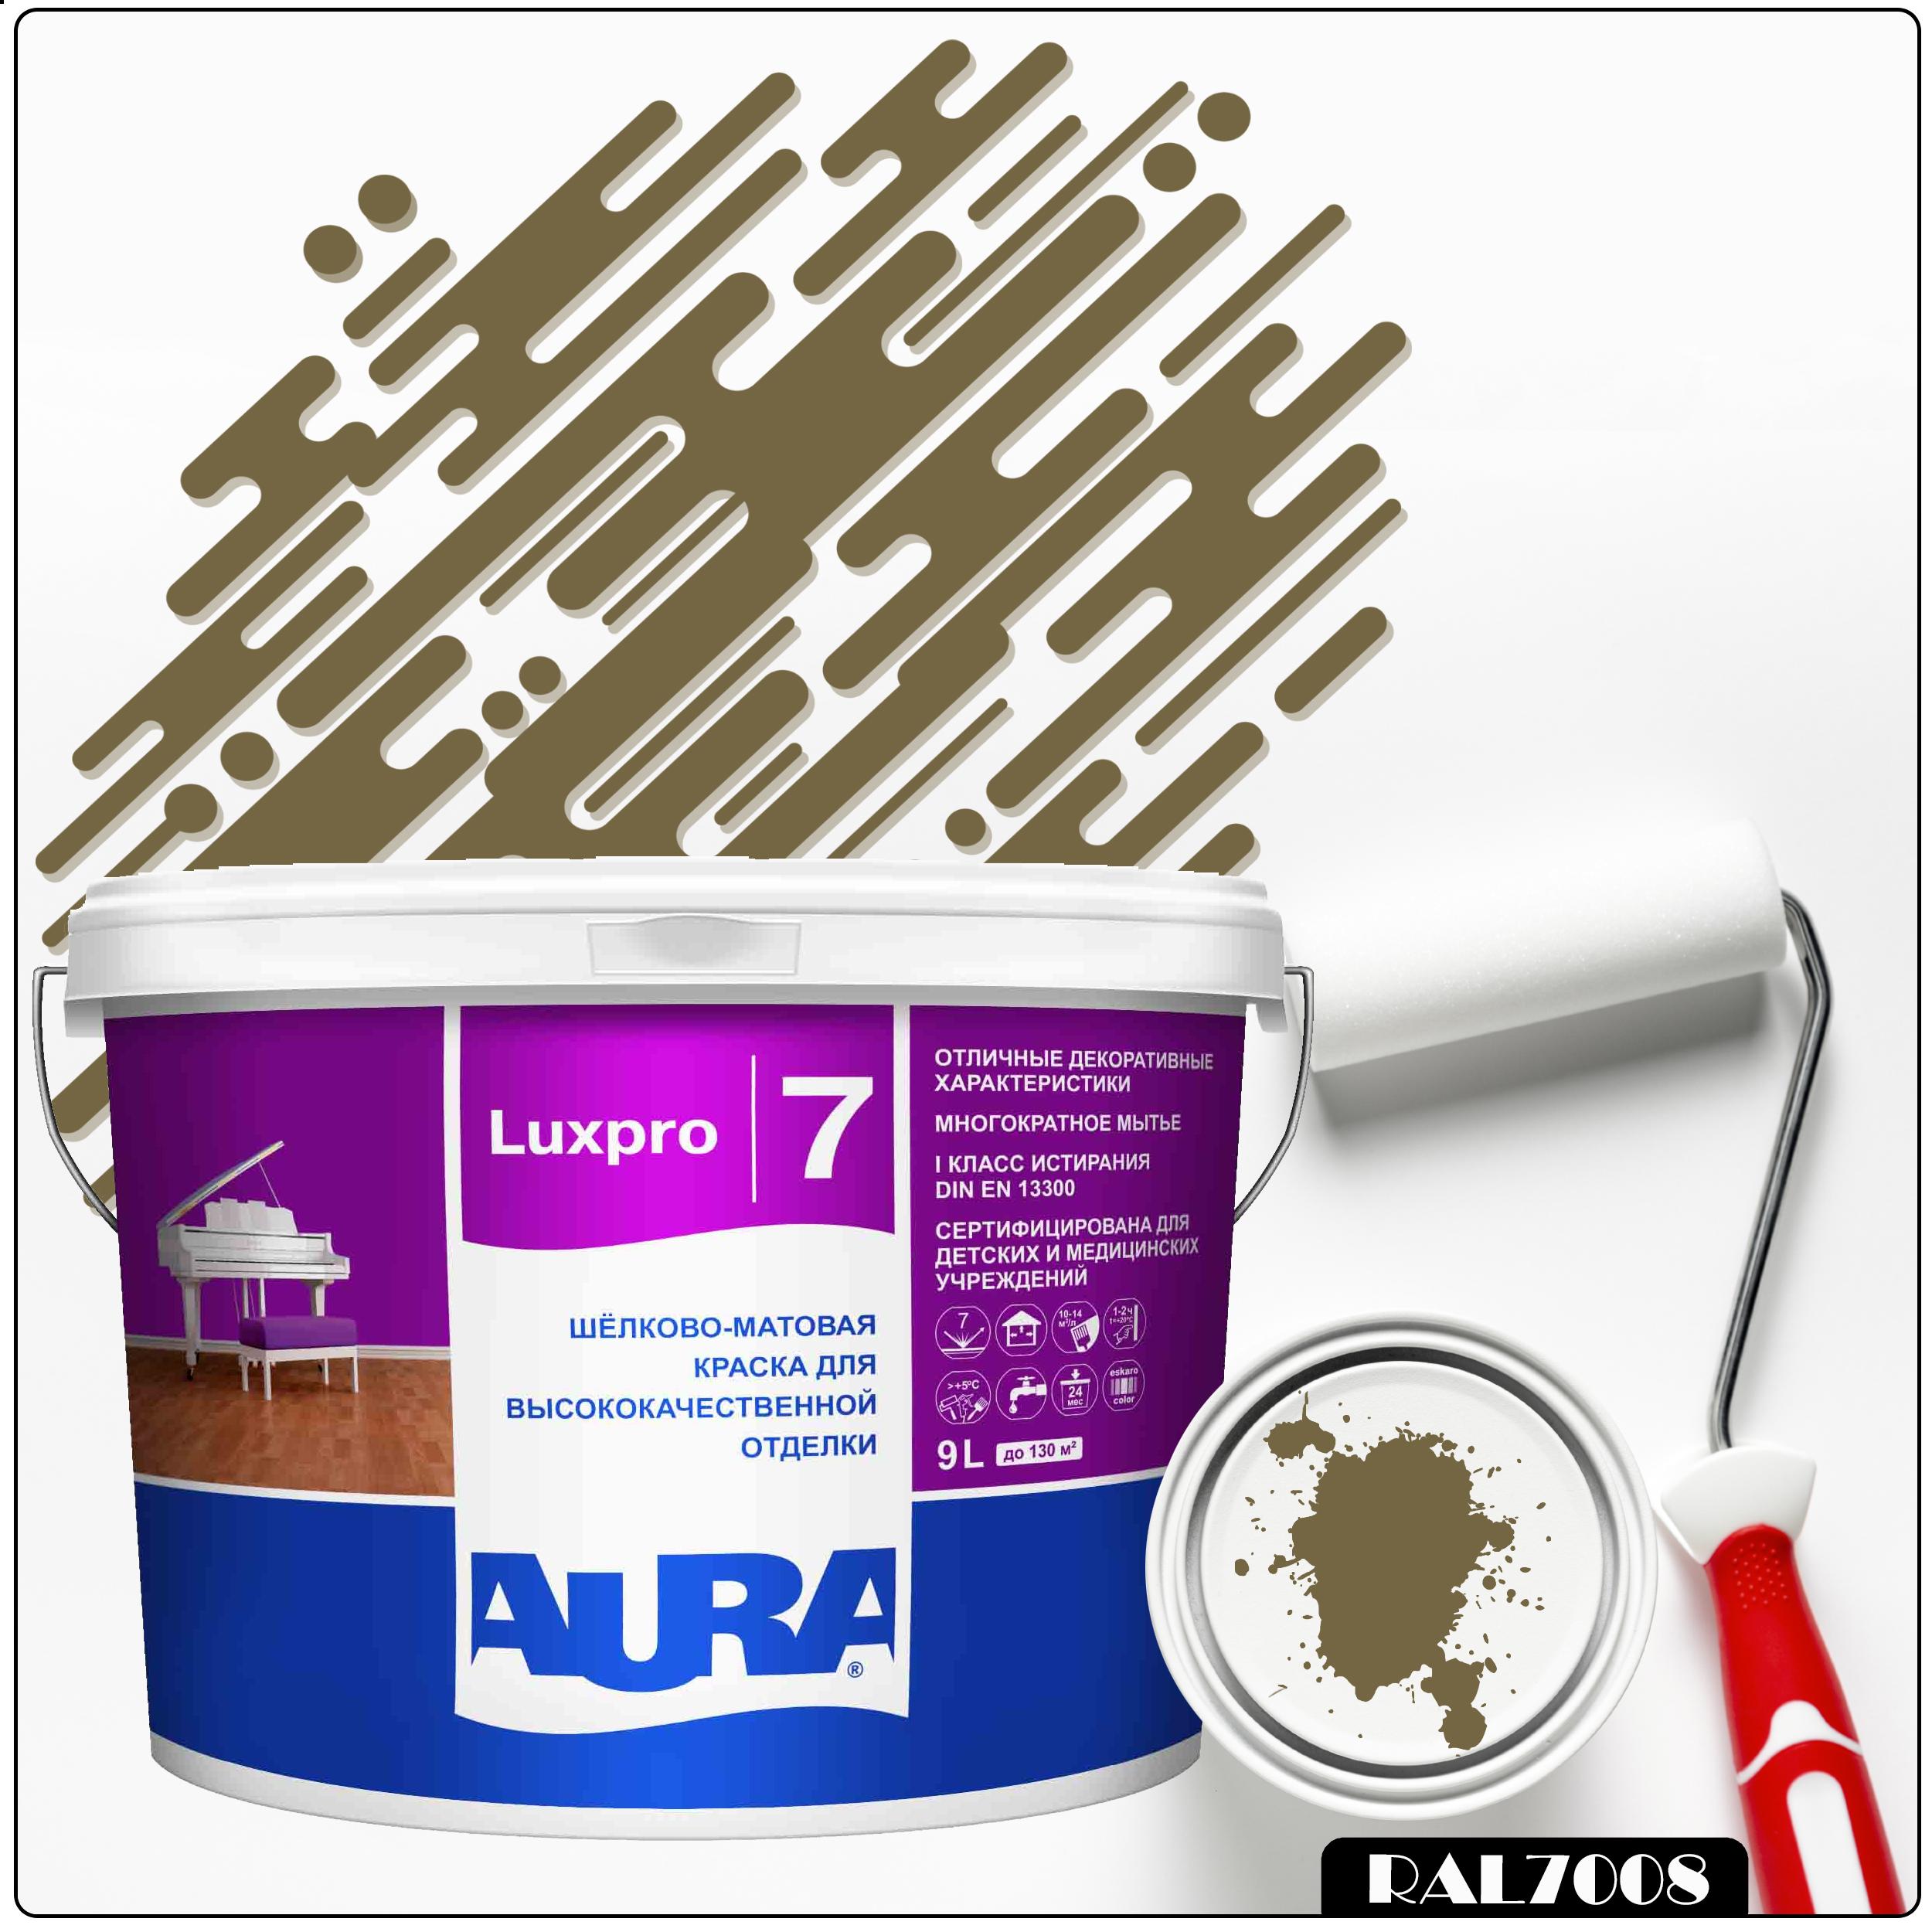 Фото 8 - Краска Aura LuxPRO 7, RAL 7008 Серое хаки, латексная, шелково-матовая, интерьерная, 9л, Аура.